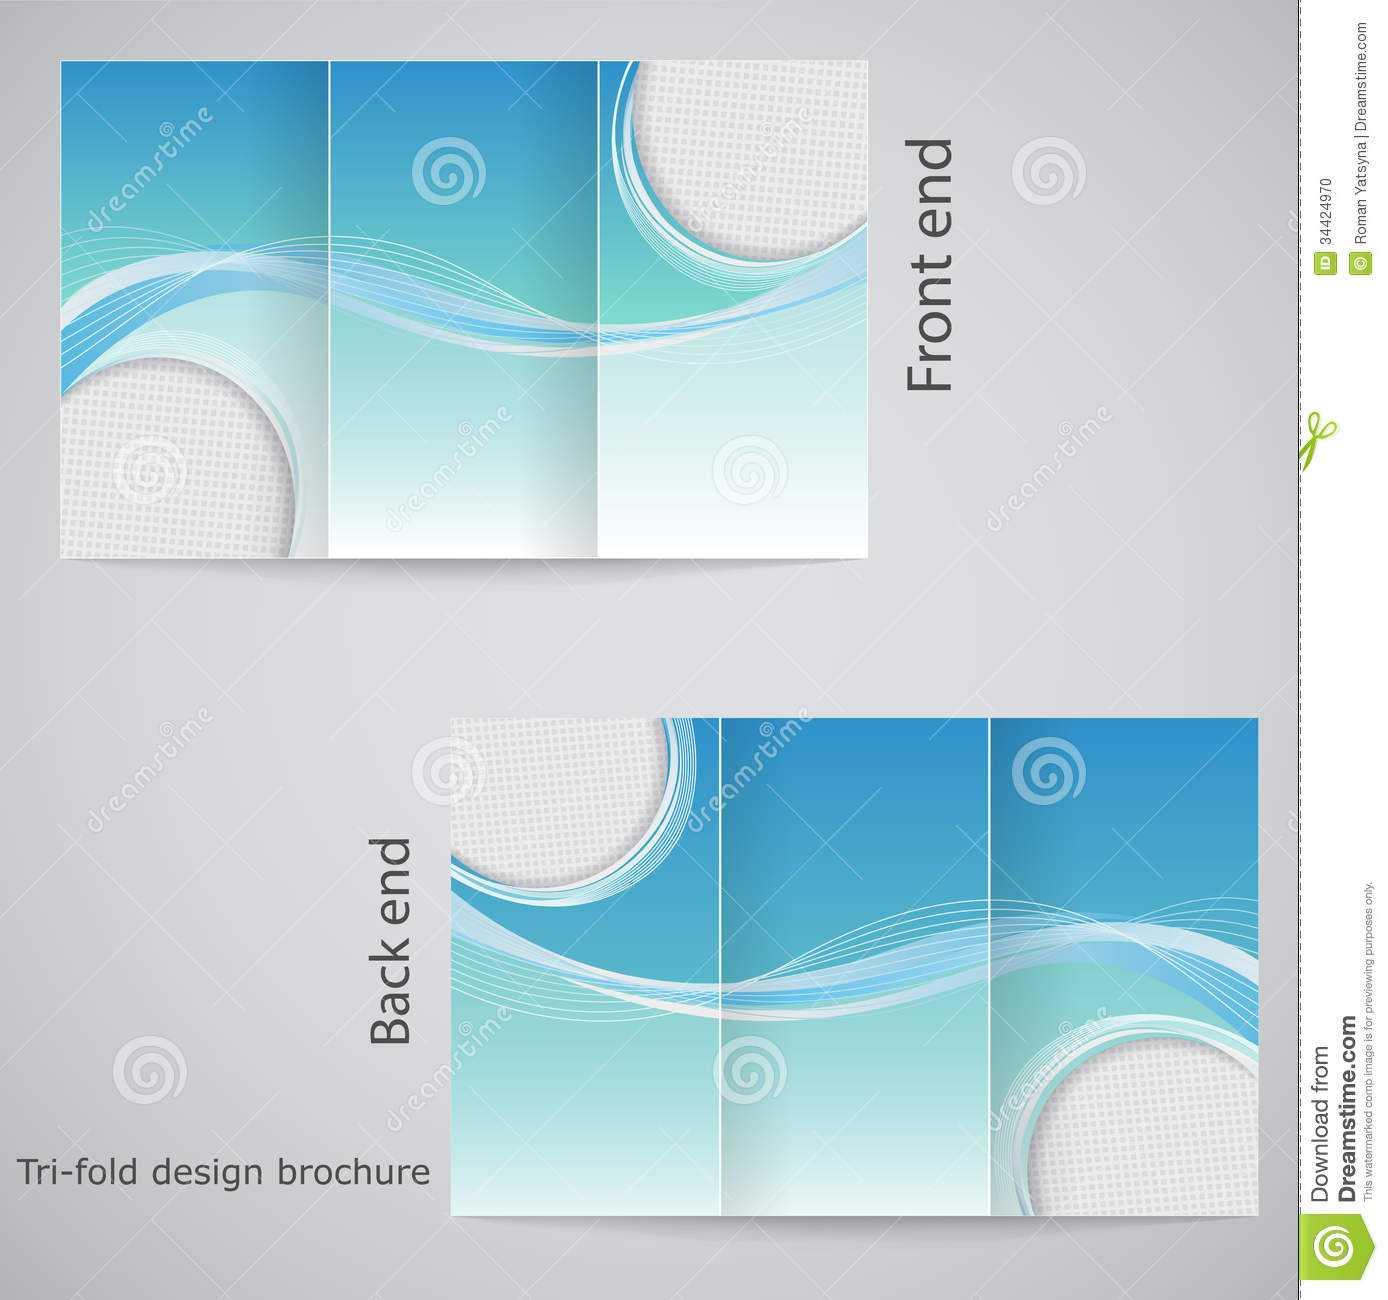 Tri-Fold Brochure Design. Stock Vector. Illustration Of in Free Three Fold Brochure Template